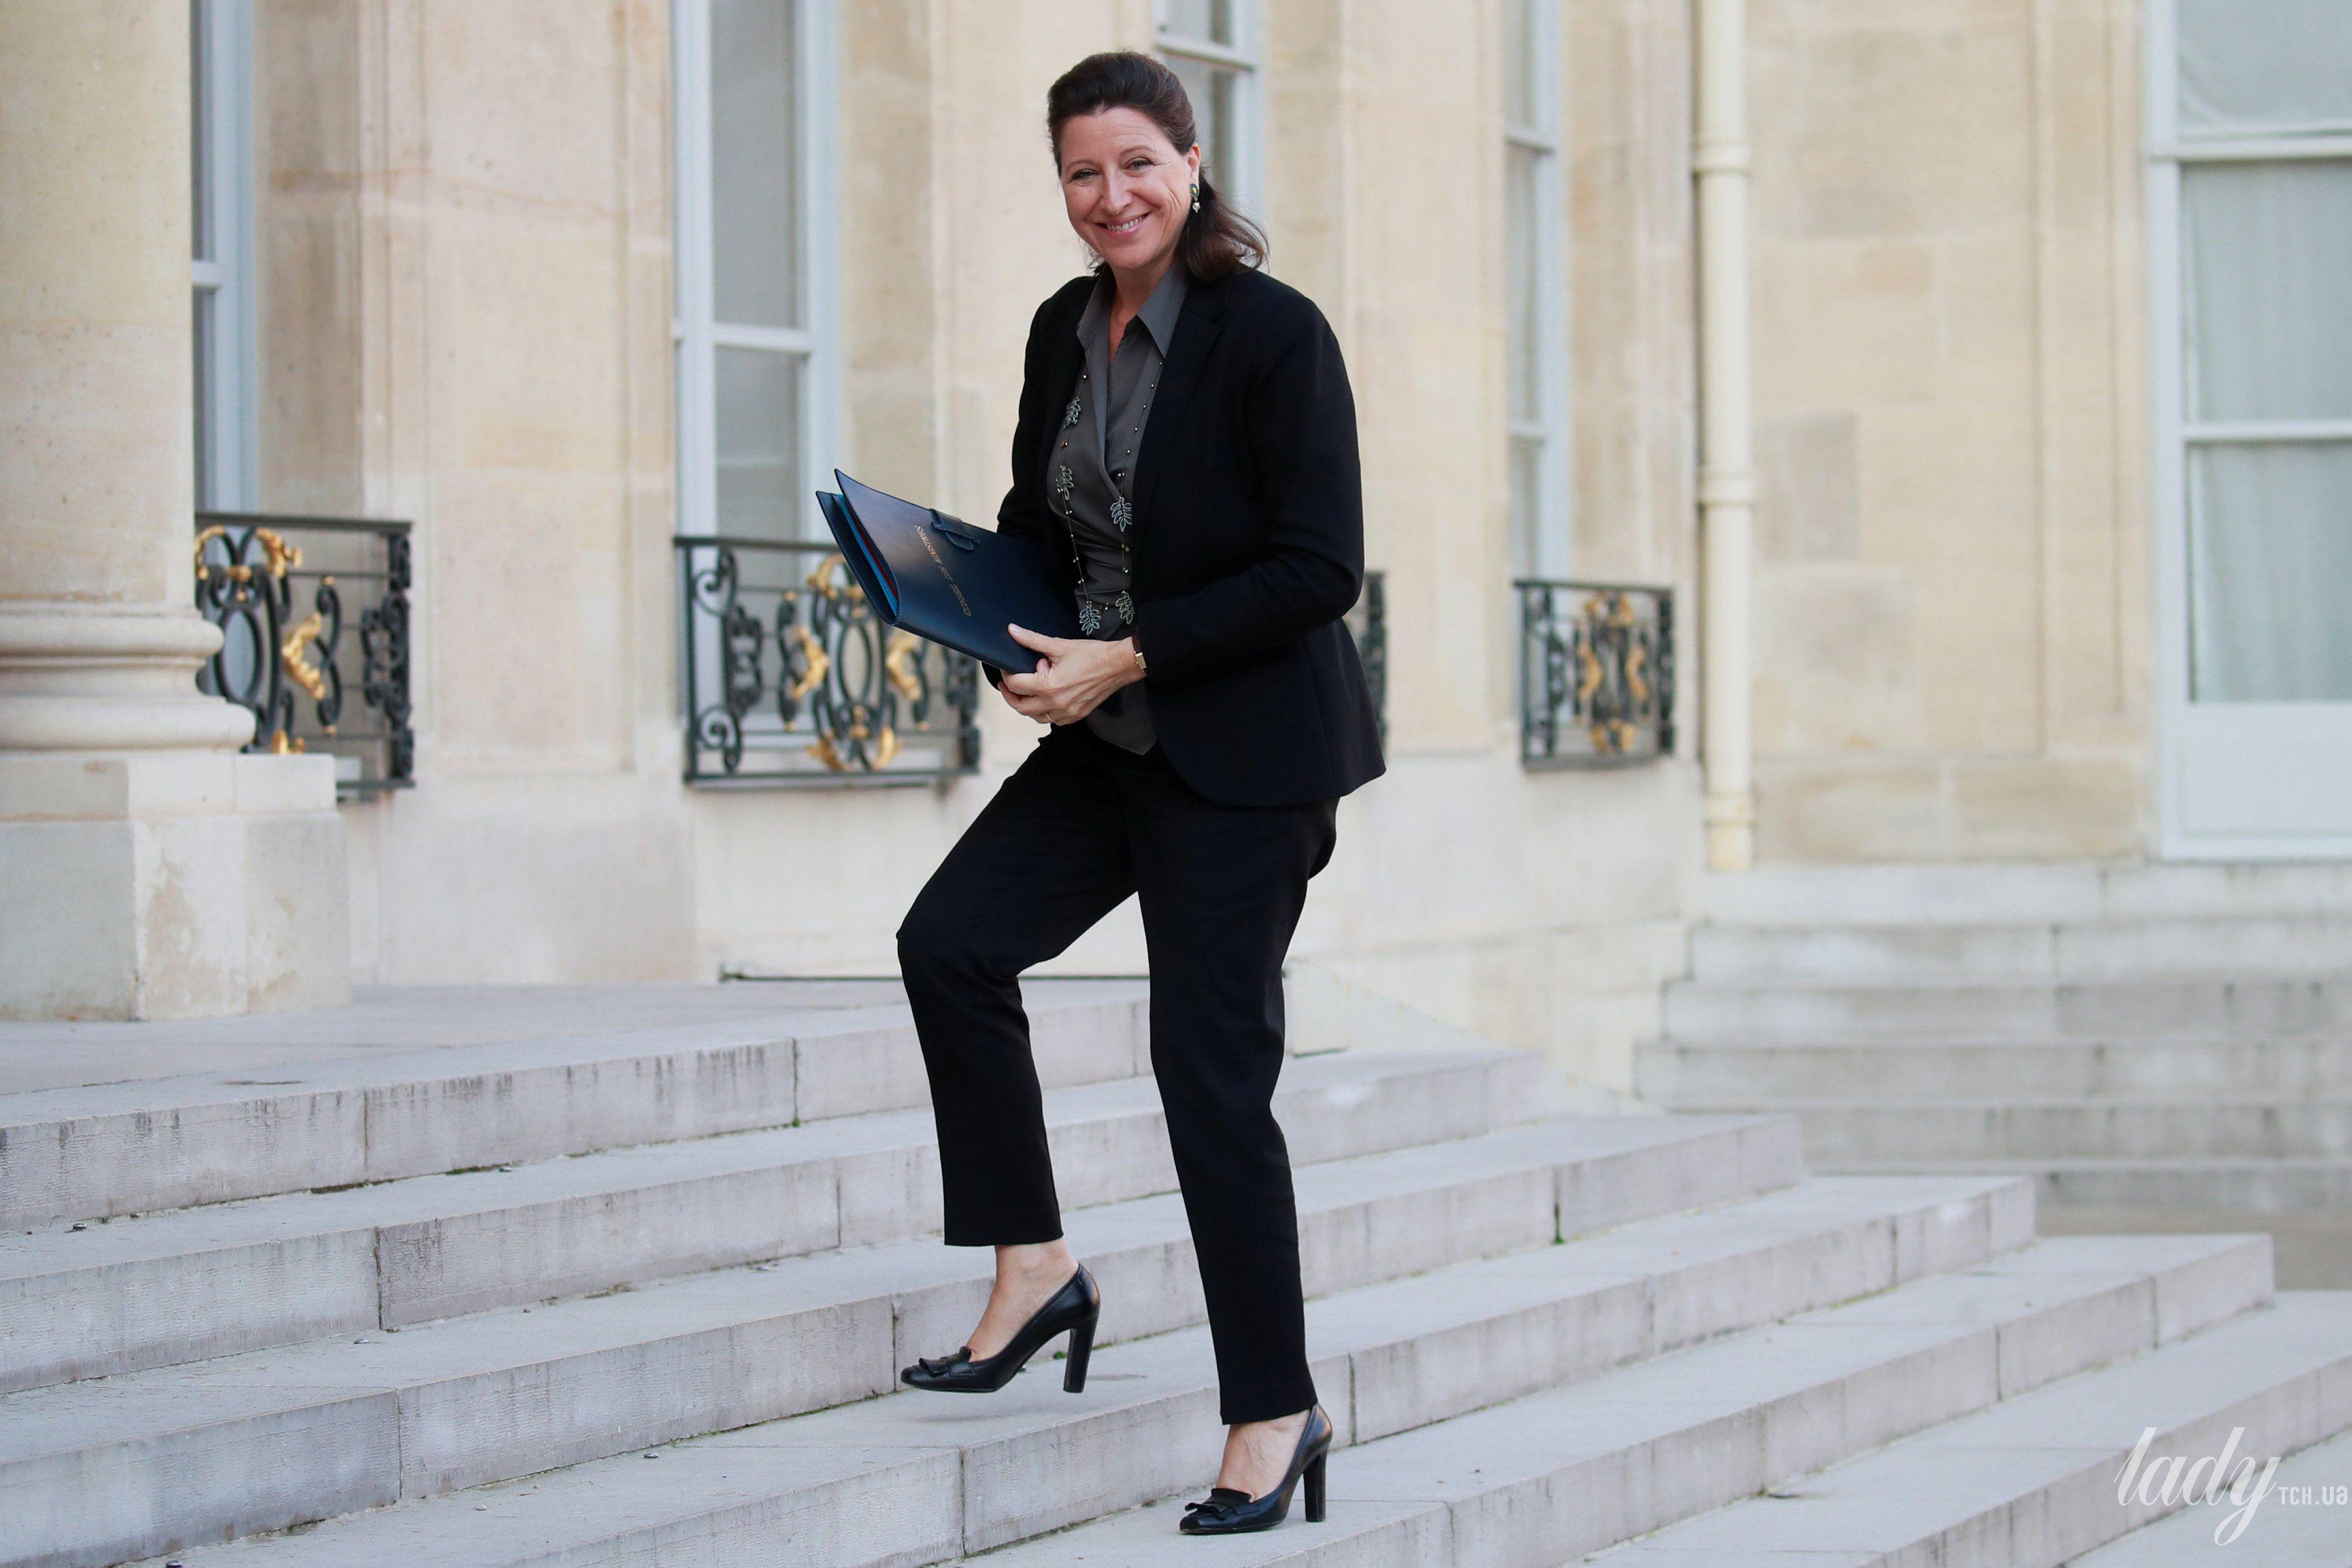 Министра солидарности и здравоохранения Франции